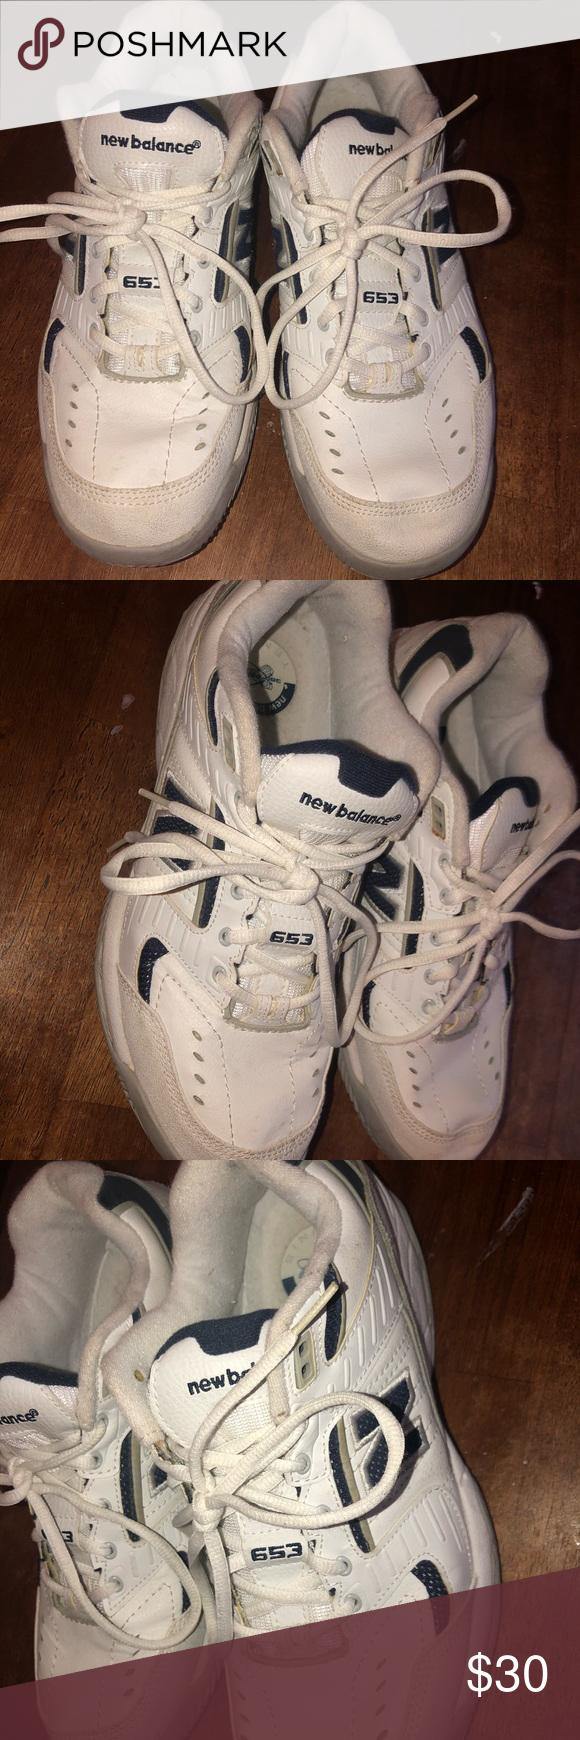 hada exceso Laboratorio  New balance 653 tennis court shoes sneakers 10.5 | Tennis court shoes,  Sneakers, Court shoes